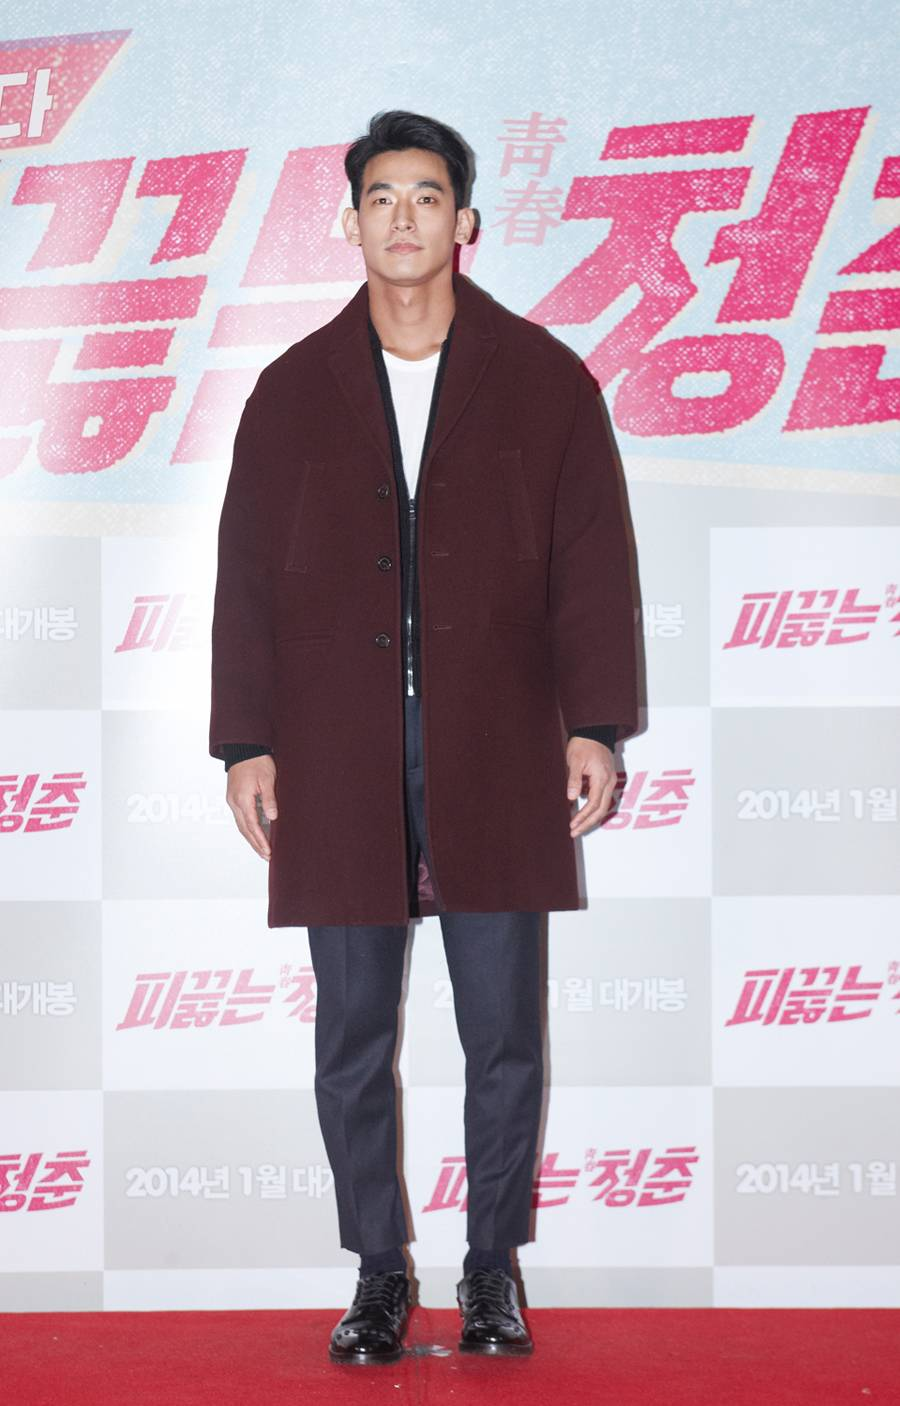 Yeon woo hyeon jin natalie - 1 part 1